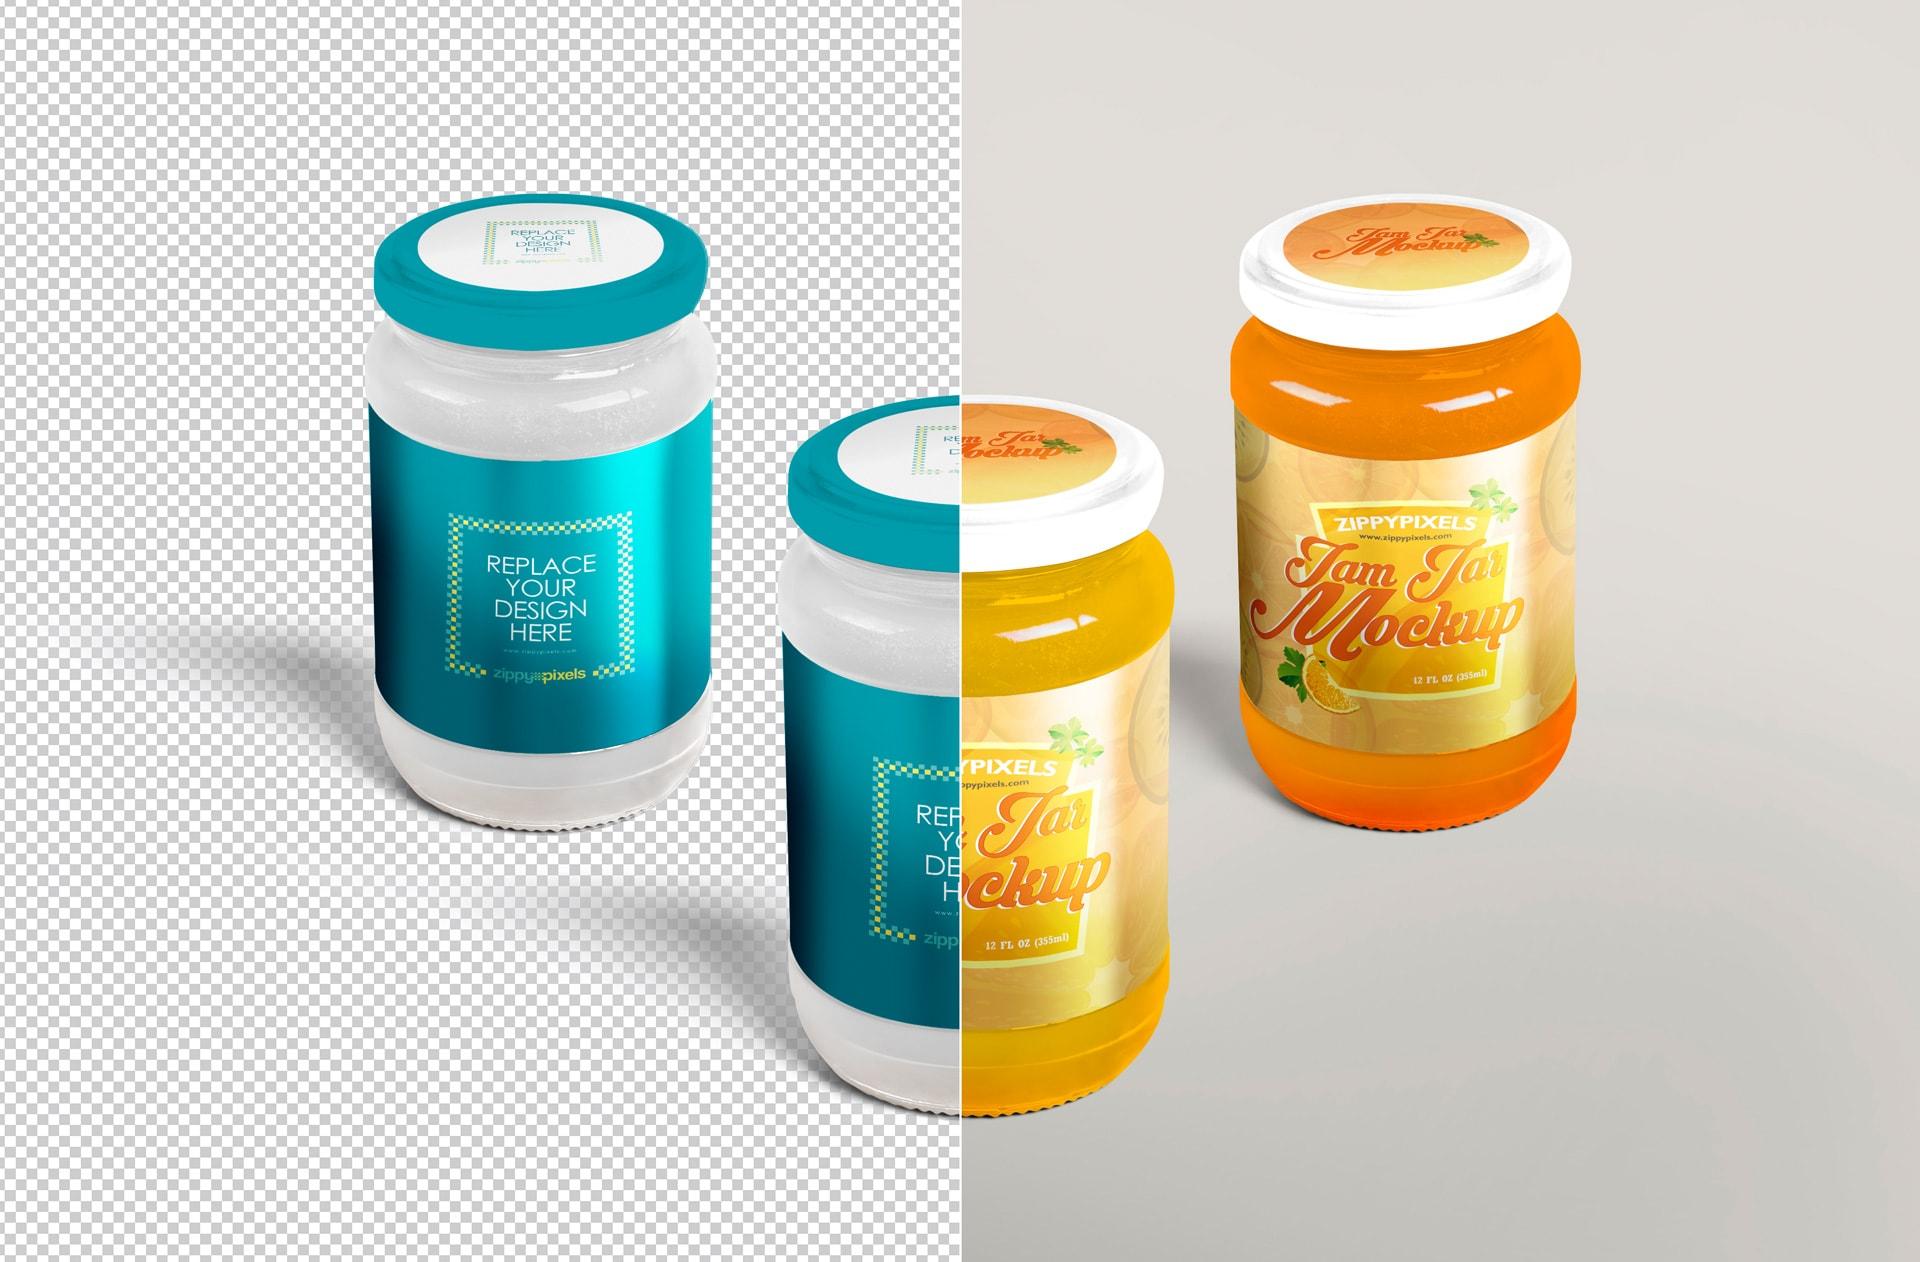 high quality jam jar PSD for your product design presentations